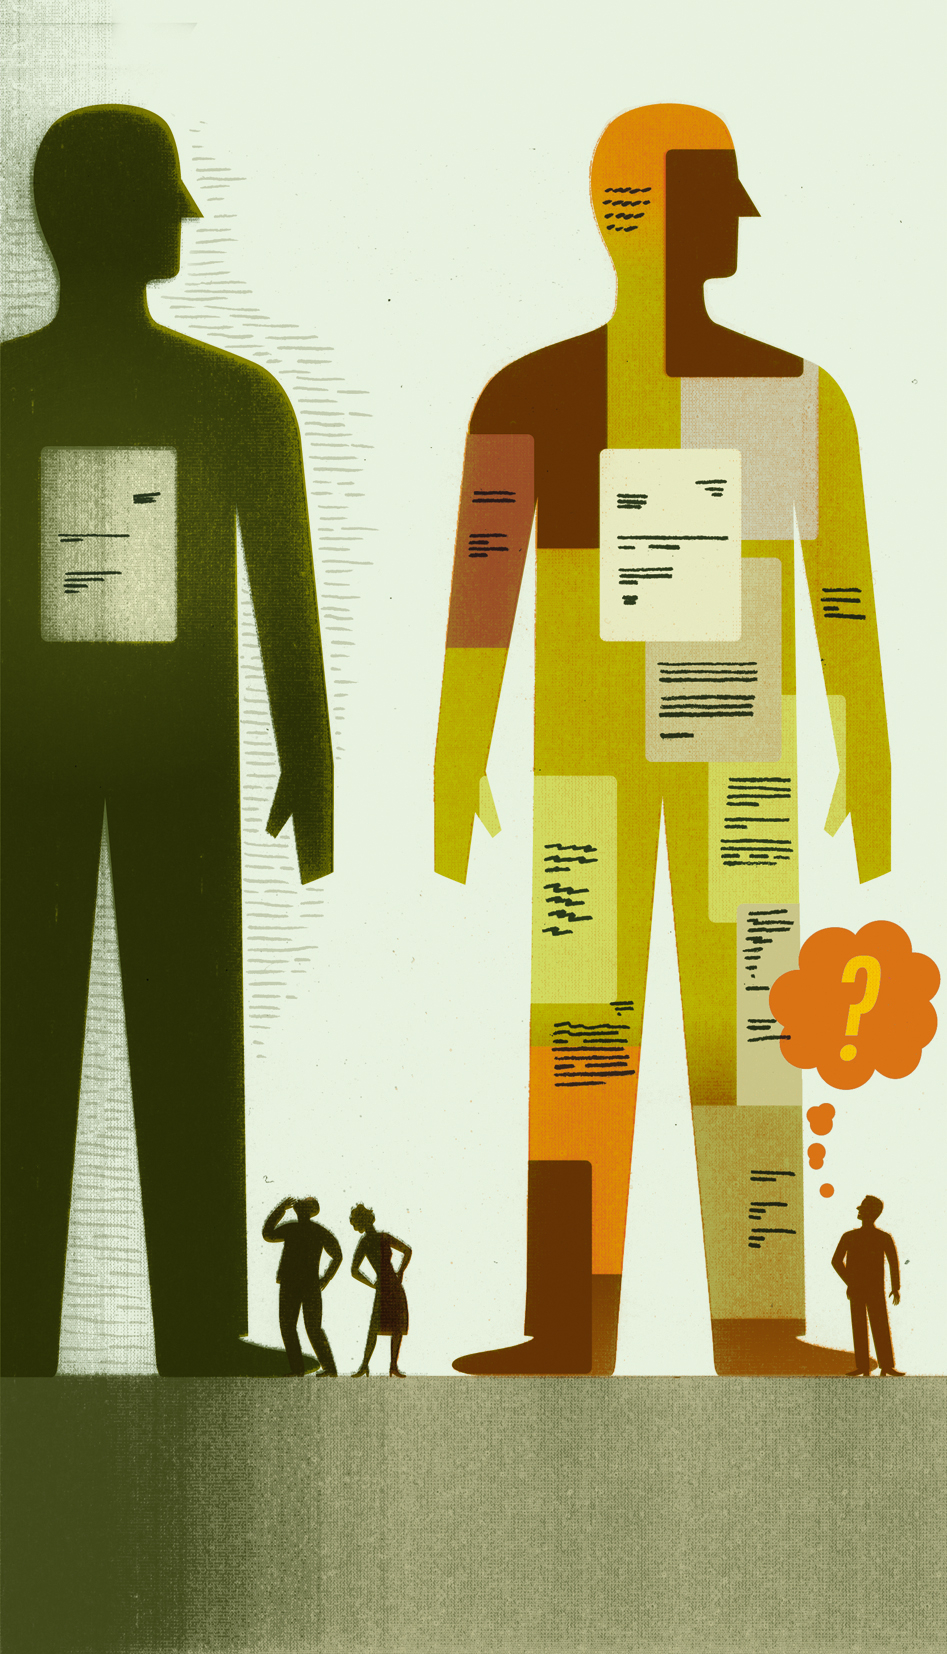 Paperwork Man